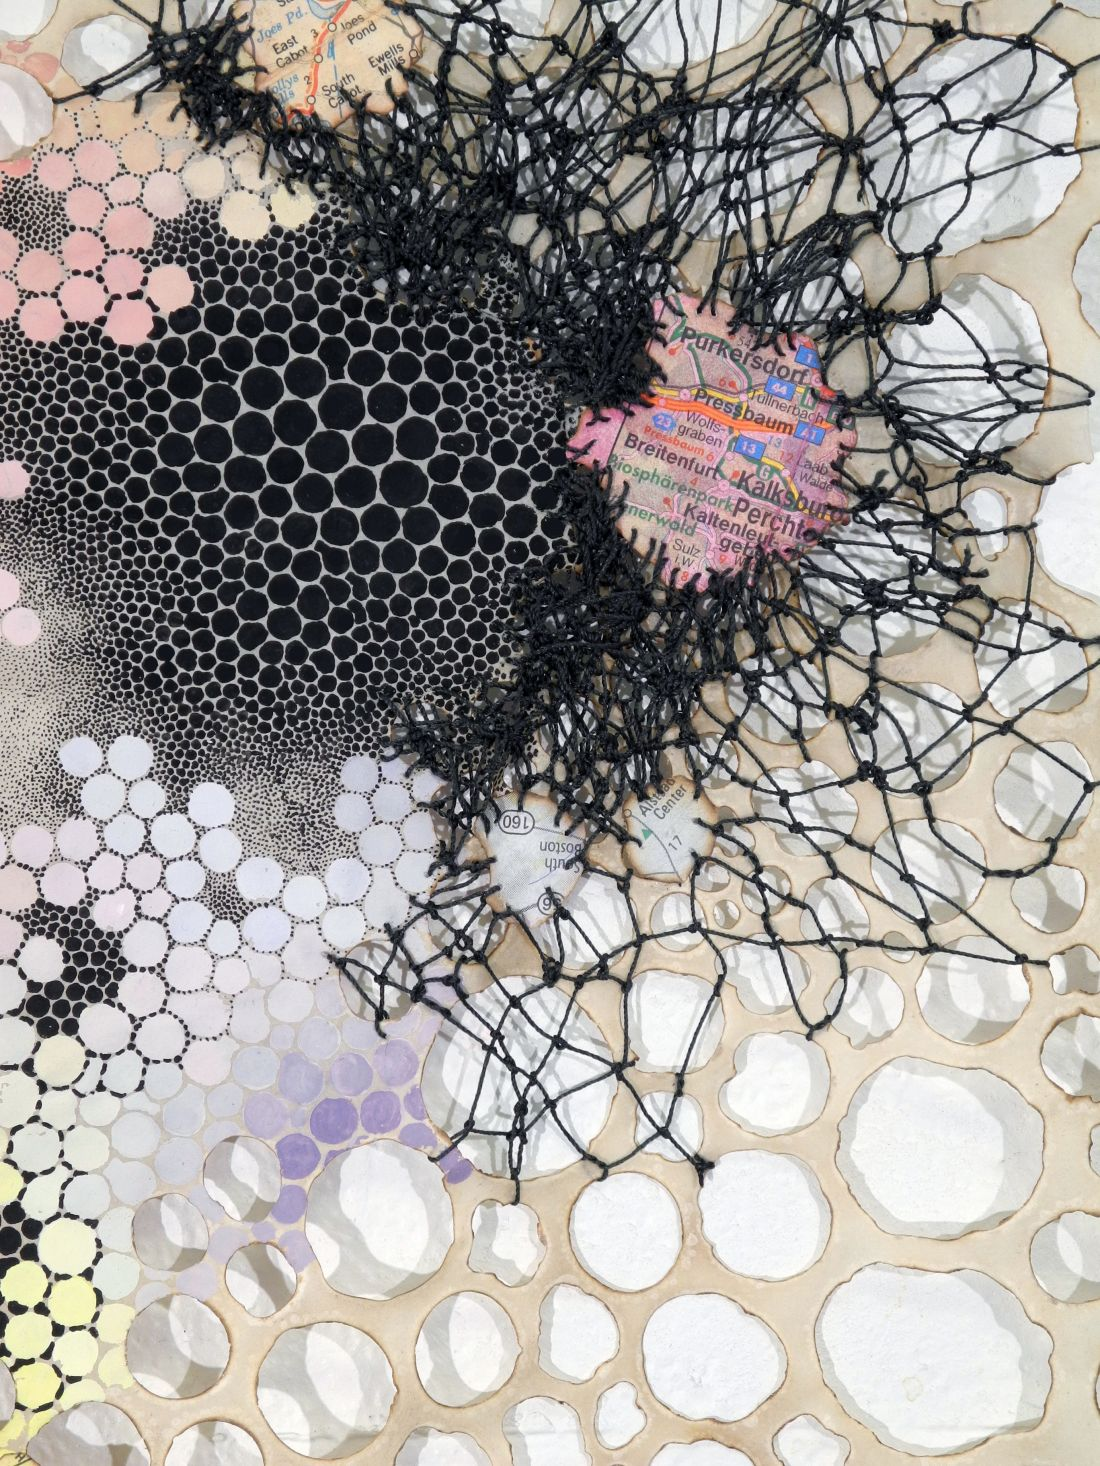 "Impedos Karen Margolis Impedes, 2018 watercolor, gouache, maps, thread on Abaca paper 14""x11"" Courtesy of the artist and Garis & Hahn"